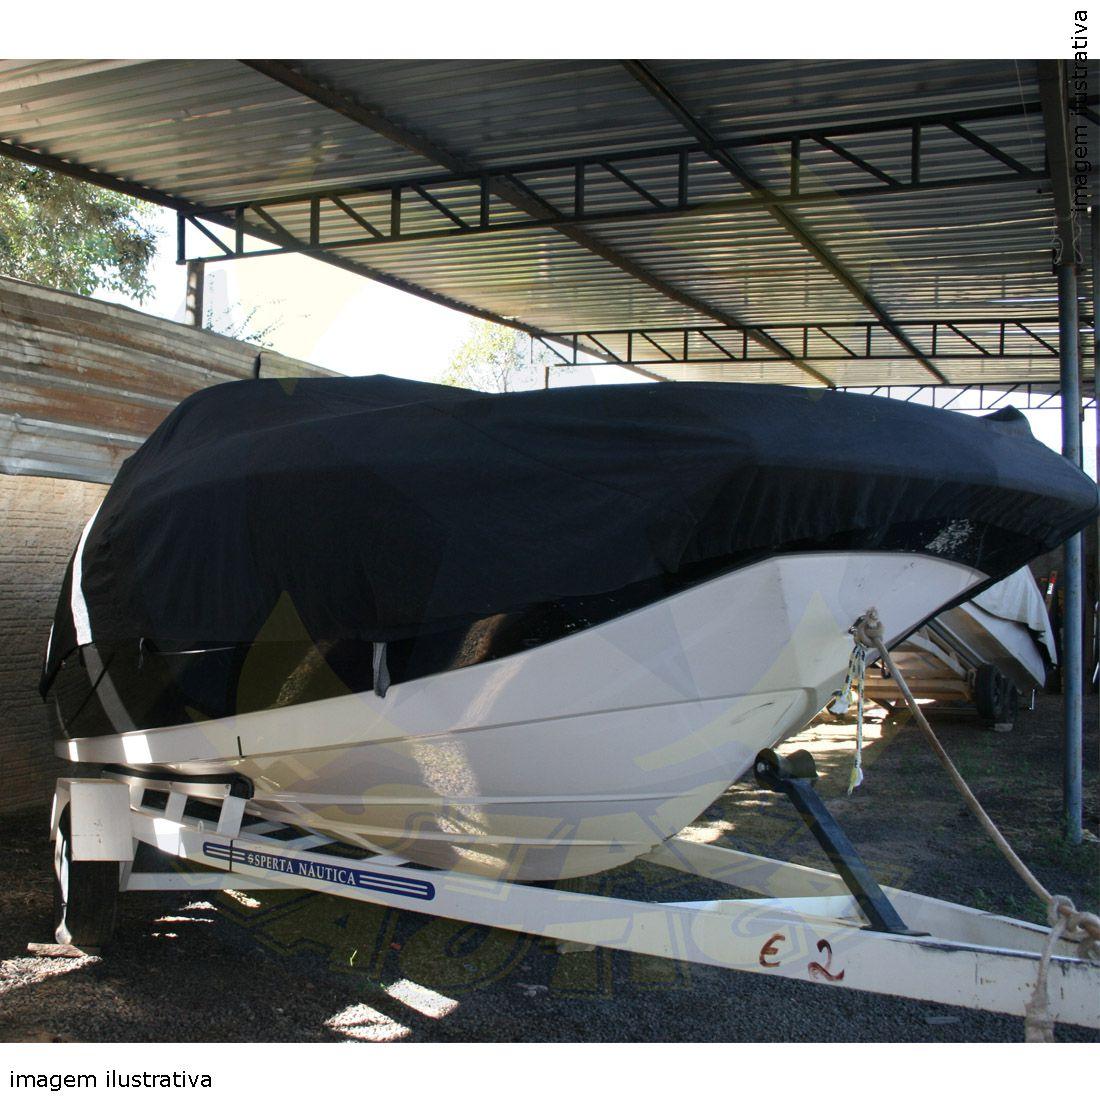 Capa Lona de Cobertura Lancha FS 200 Lona Guarda Chuva